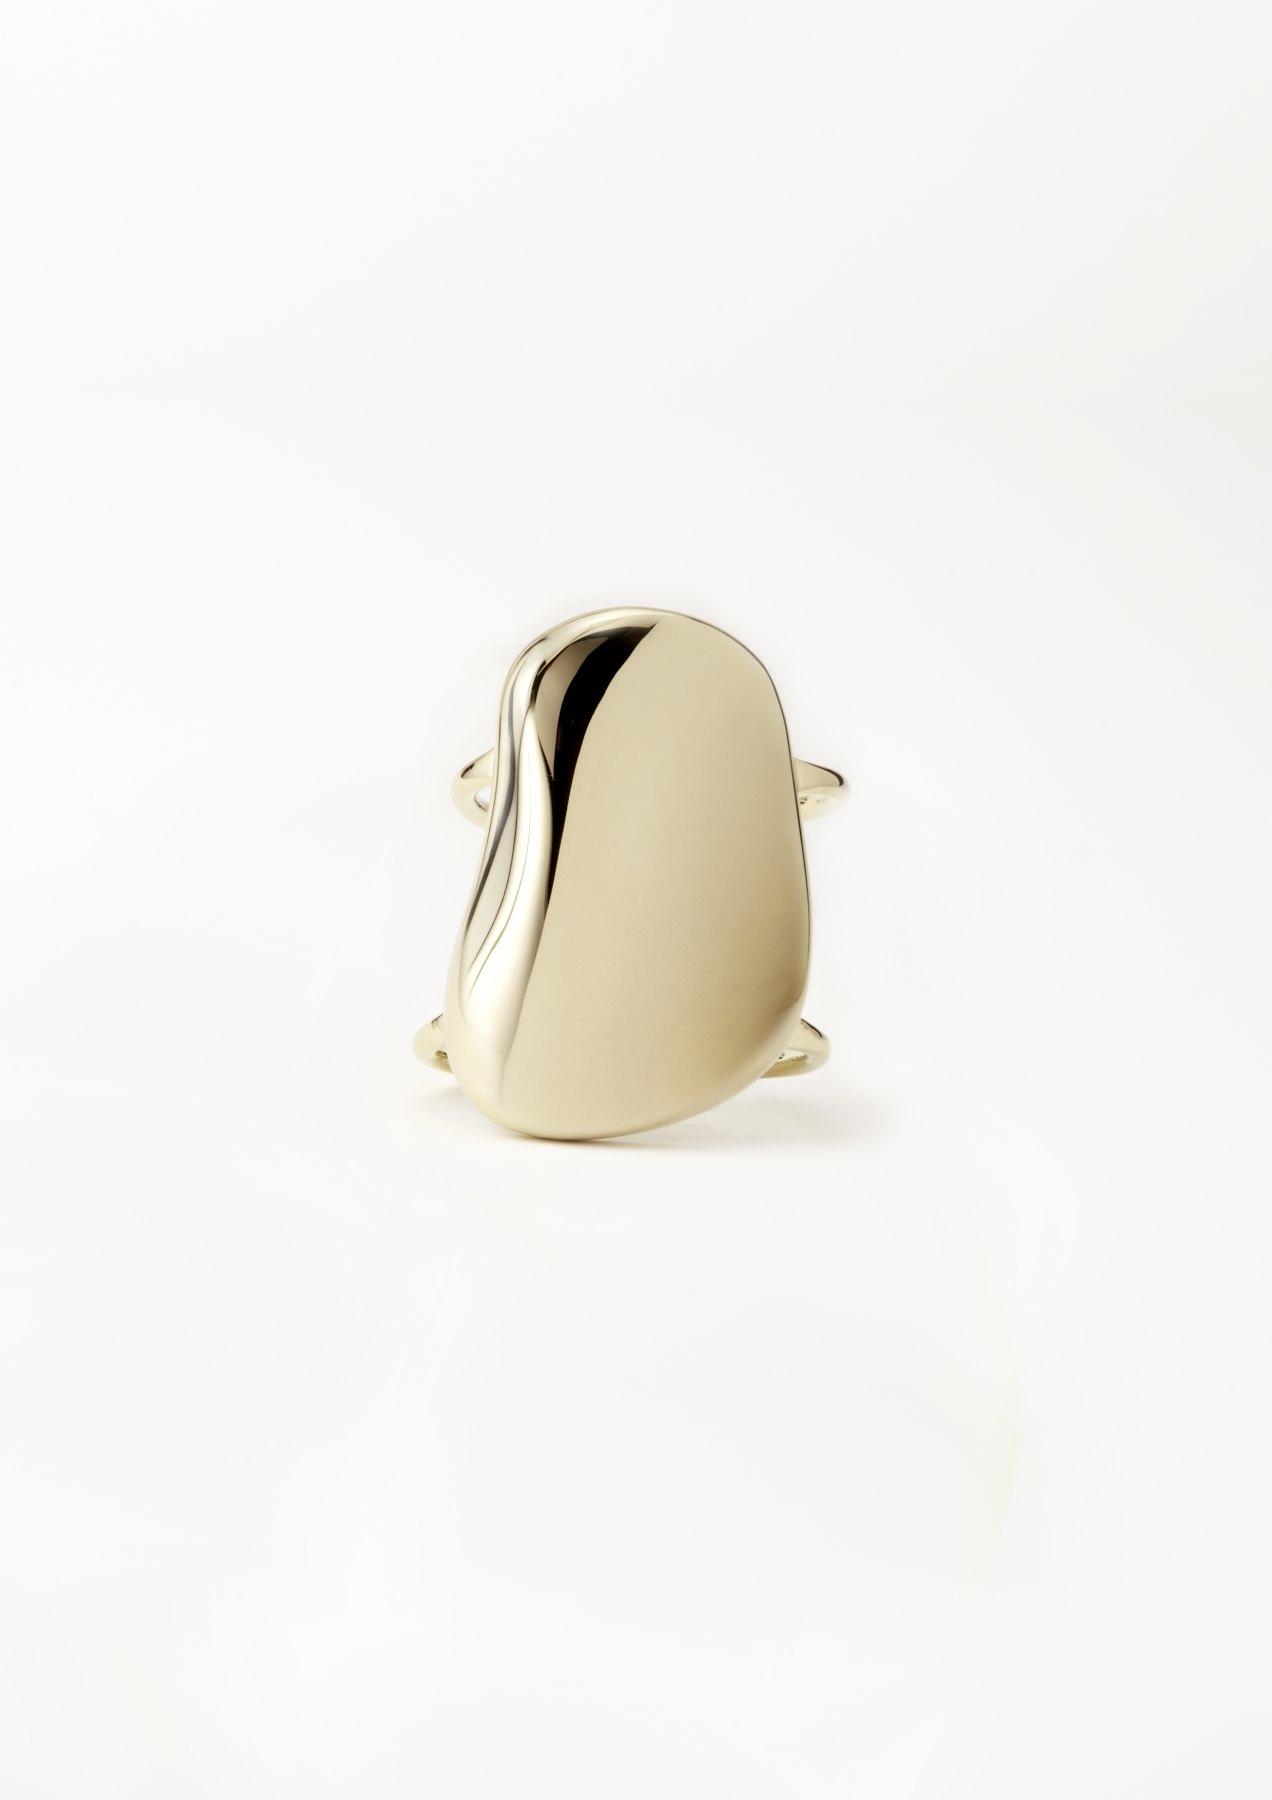 xenia bous schmuck Golden Stone 33 Round Stone Cuff Armband gold silber